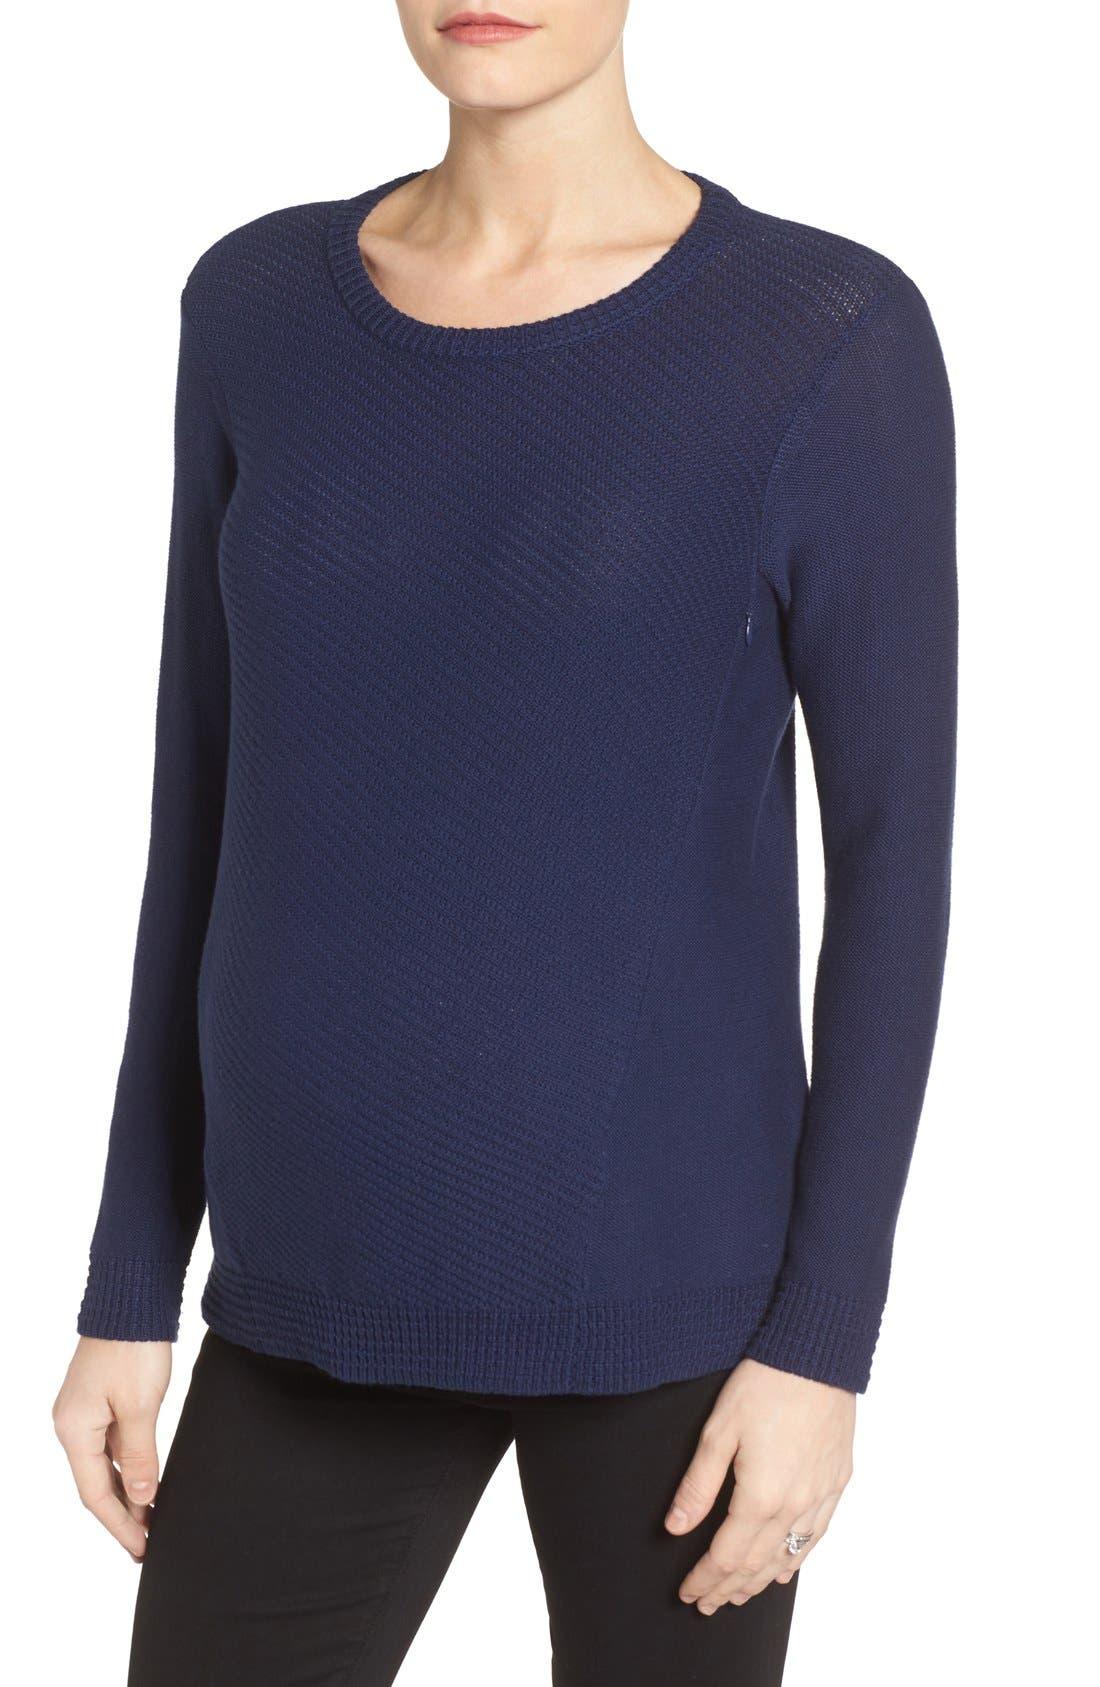 Main Image - Loyal Hana Wiley Maternity/Nursing Sweatshirt